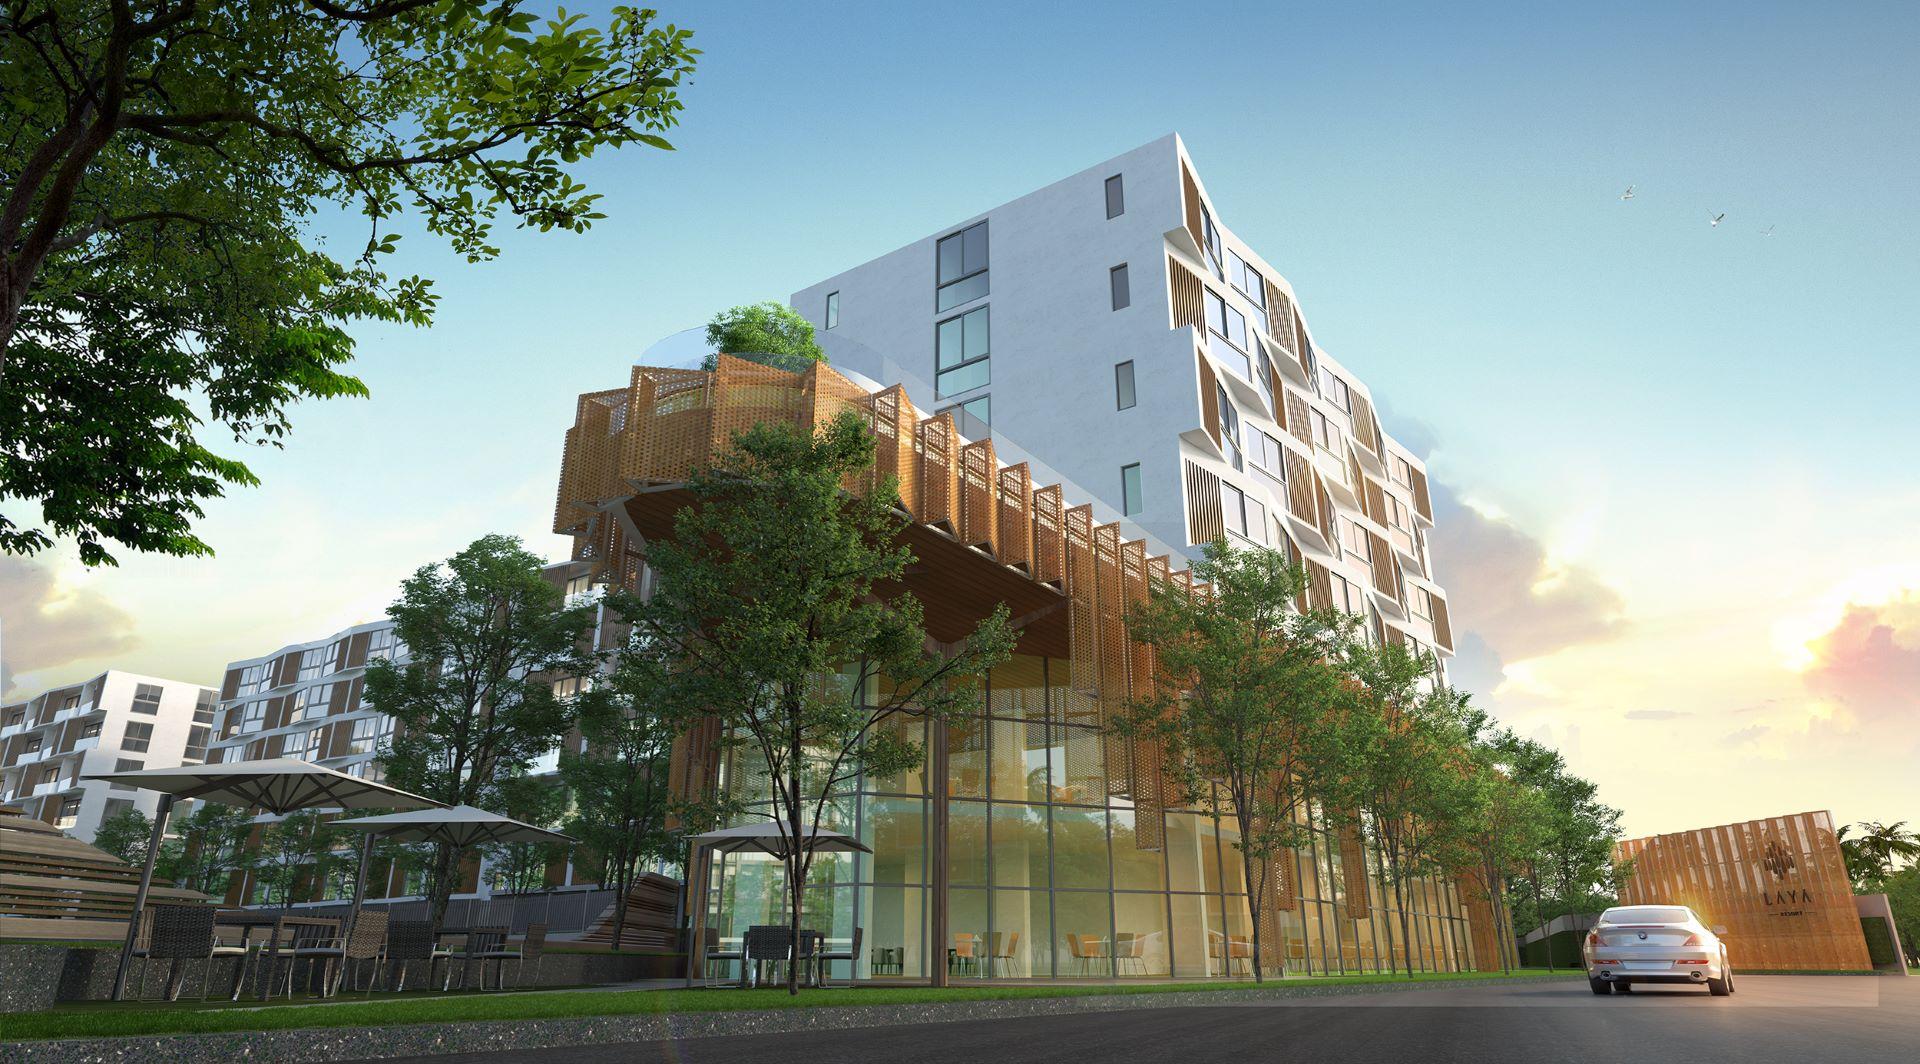 1 Bed Condominium for sale in Layan beach, Phuket